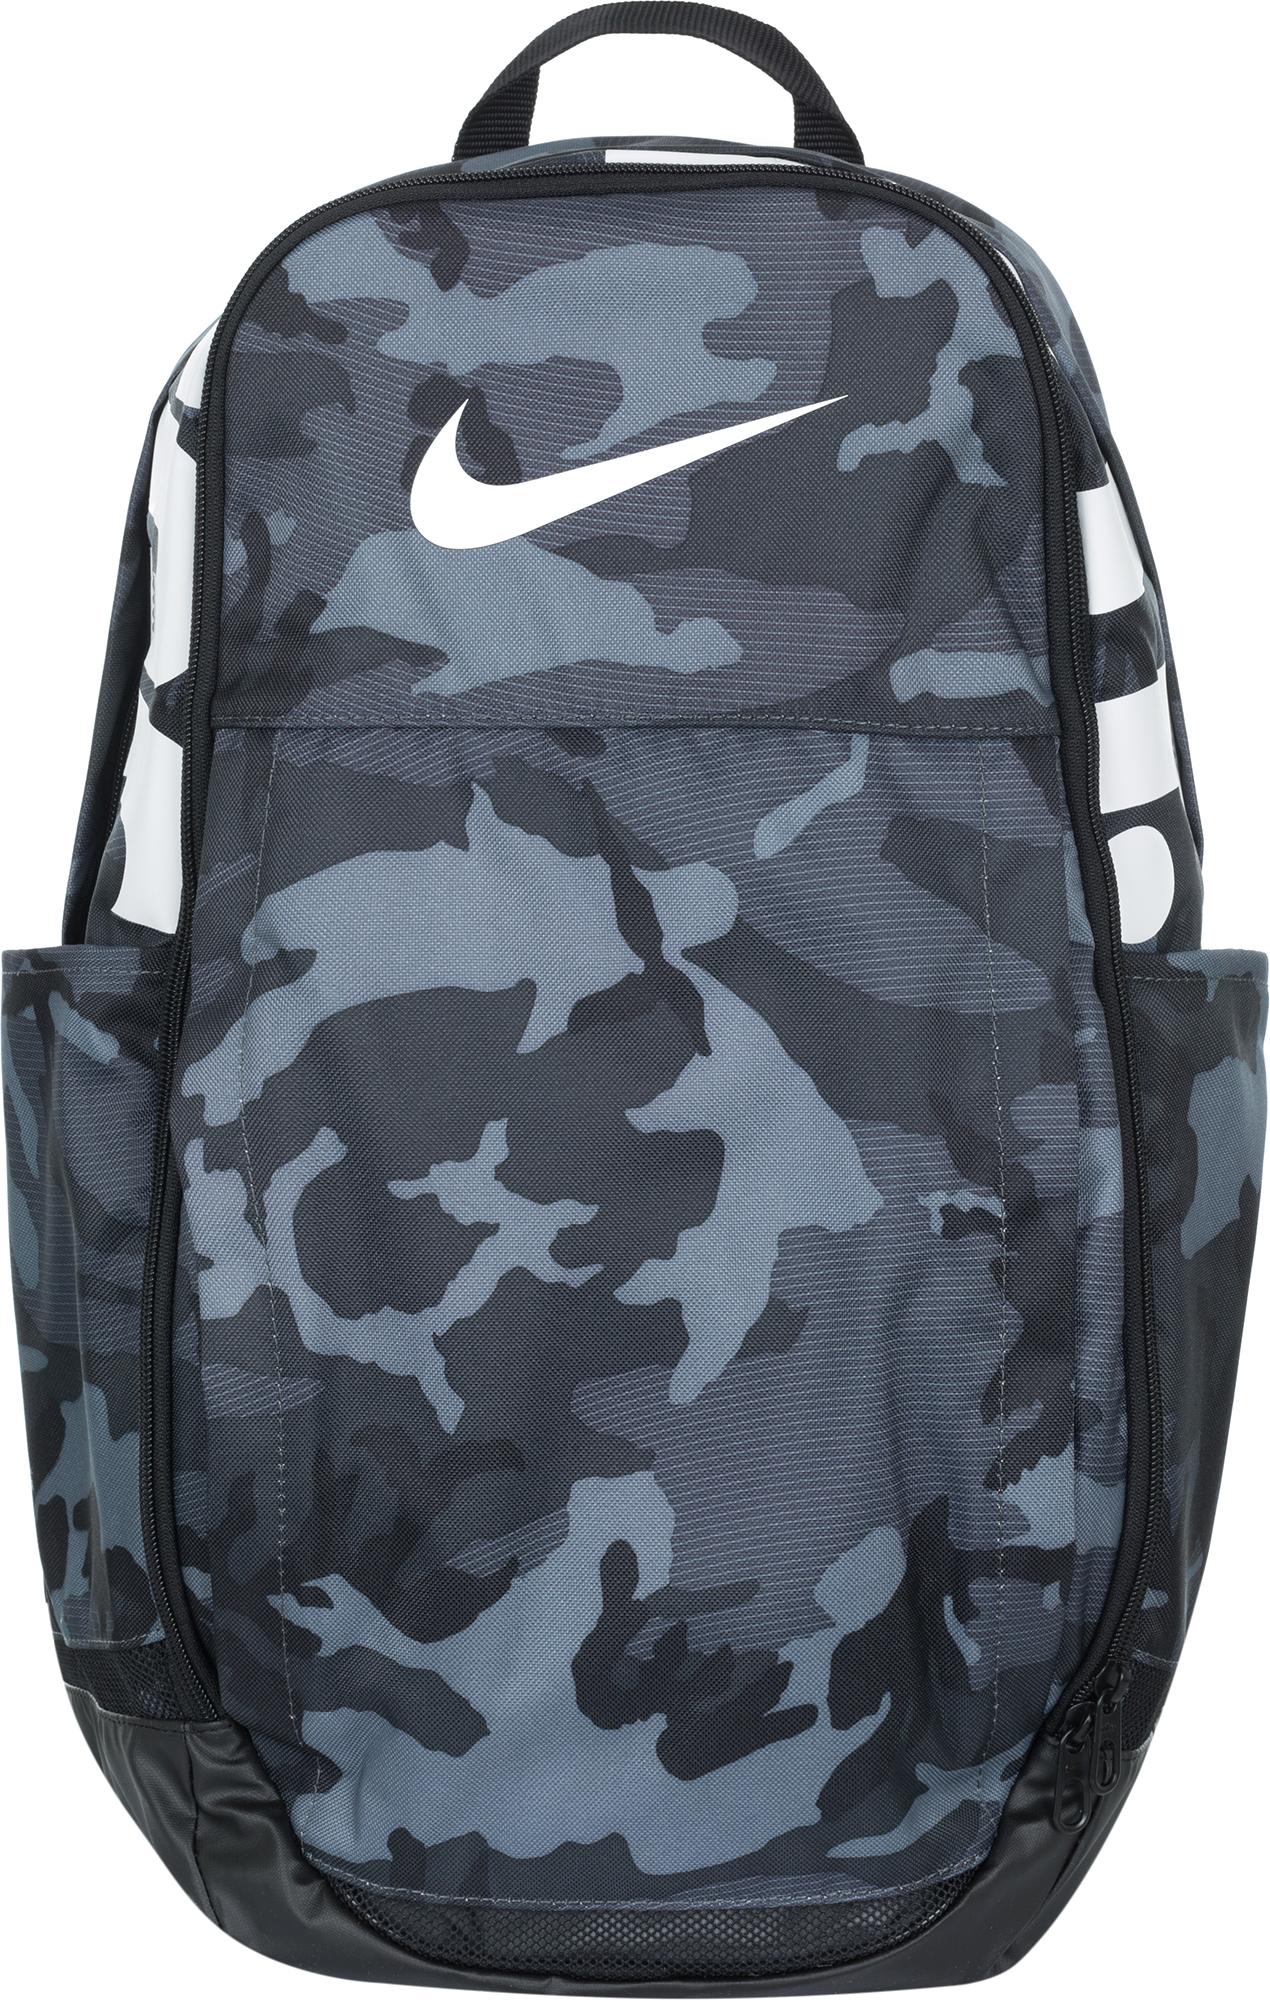 Nike Рюкзак Nike Brasilia, размер Без размера рюкзак детский nike brasilia backpack ba5473 480